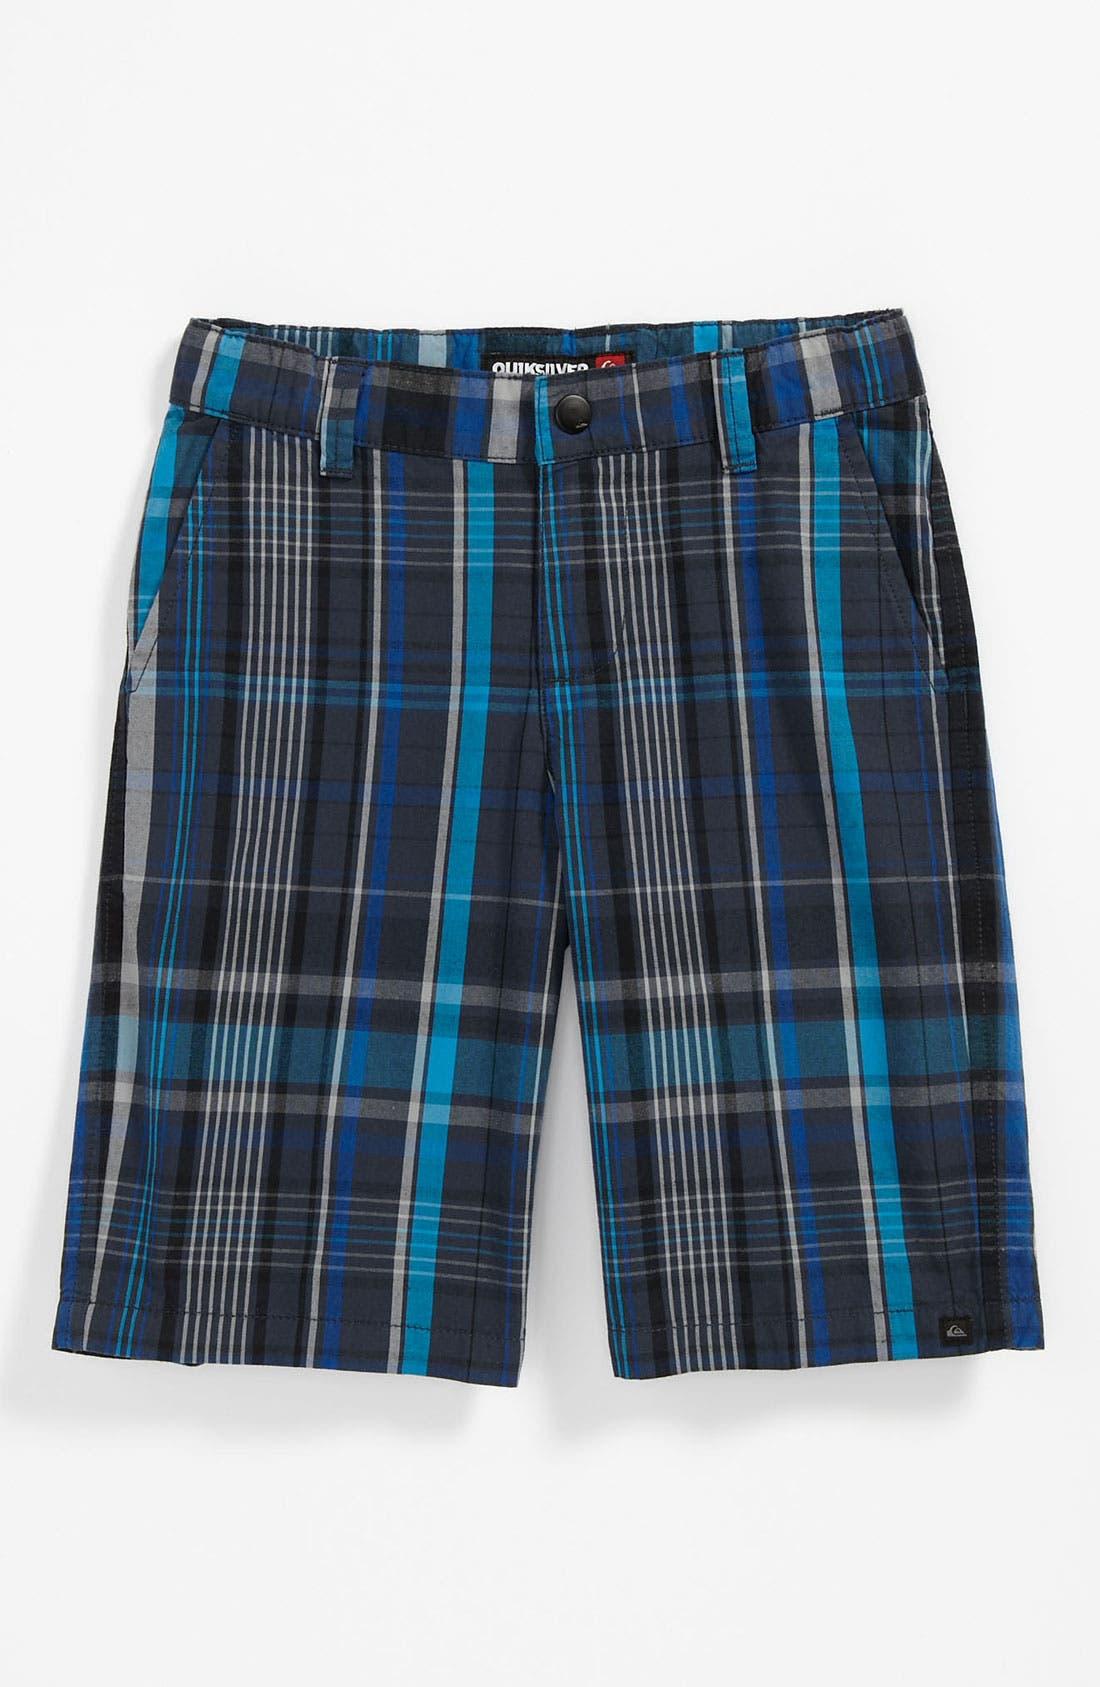 Alternate Image 1 Selected - Quiksilver 'Cordova' Shorts (Big Boys)